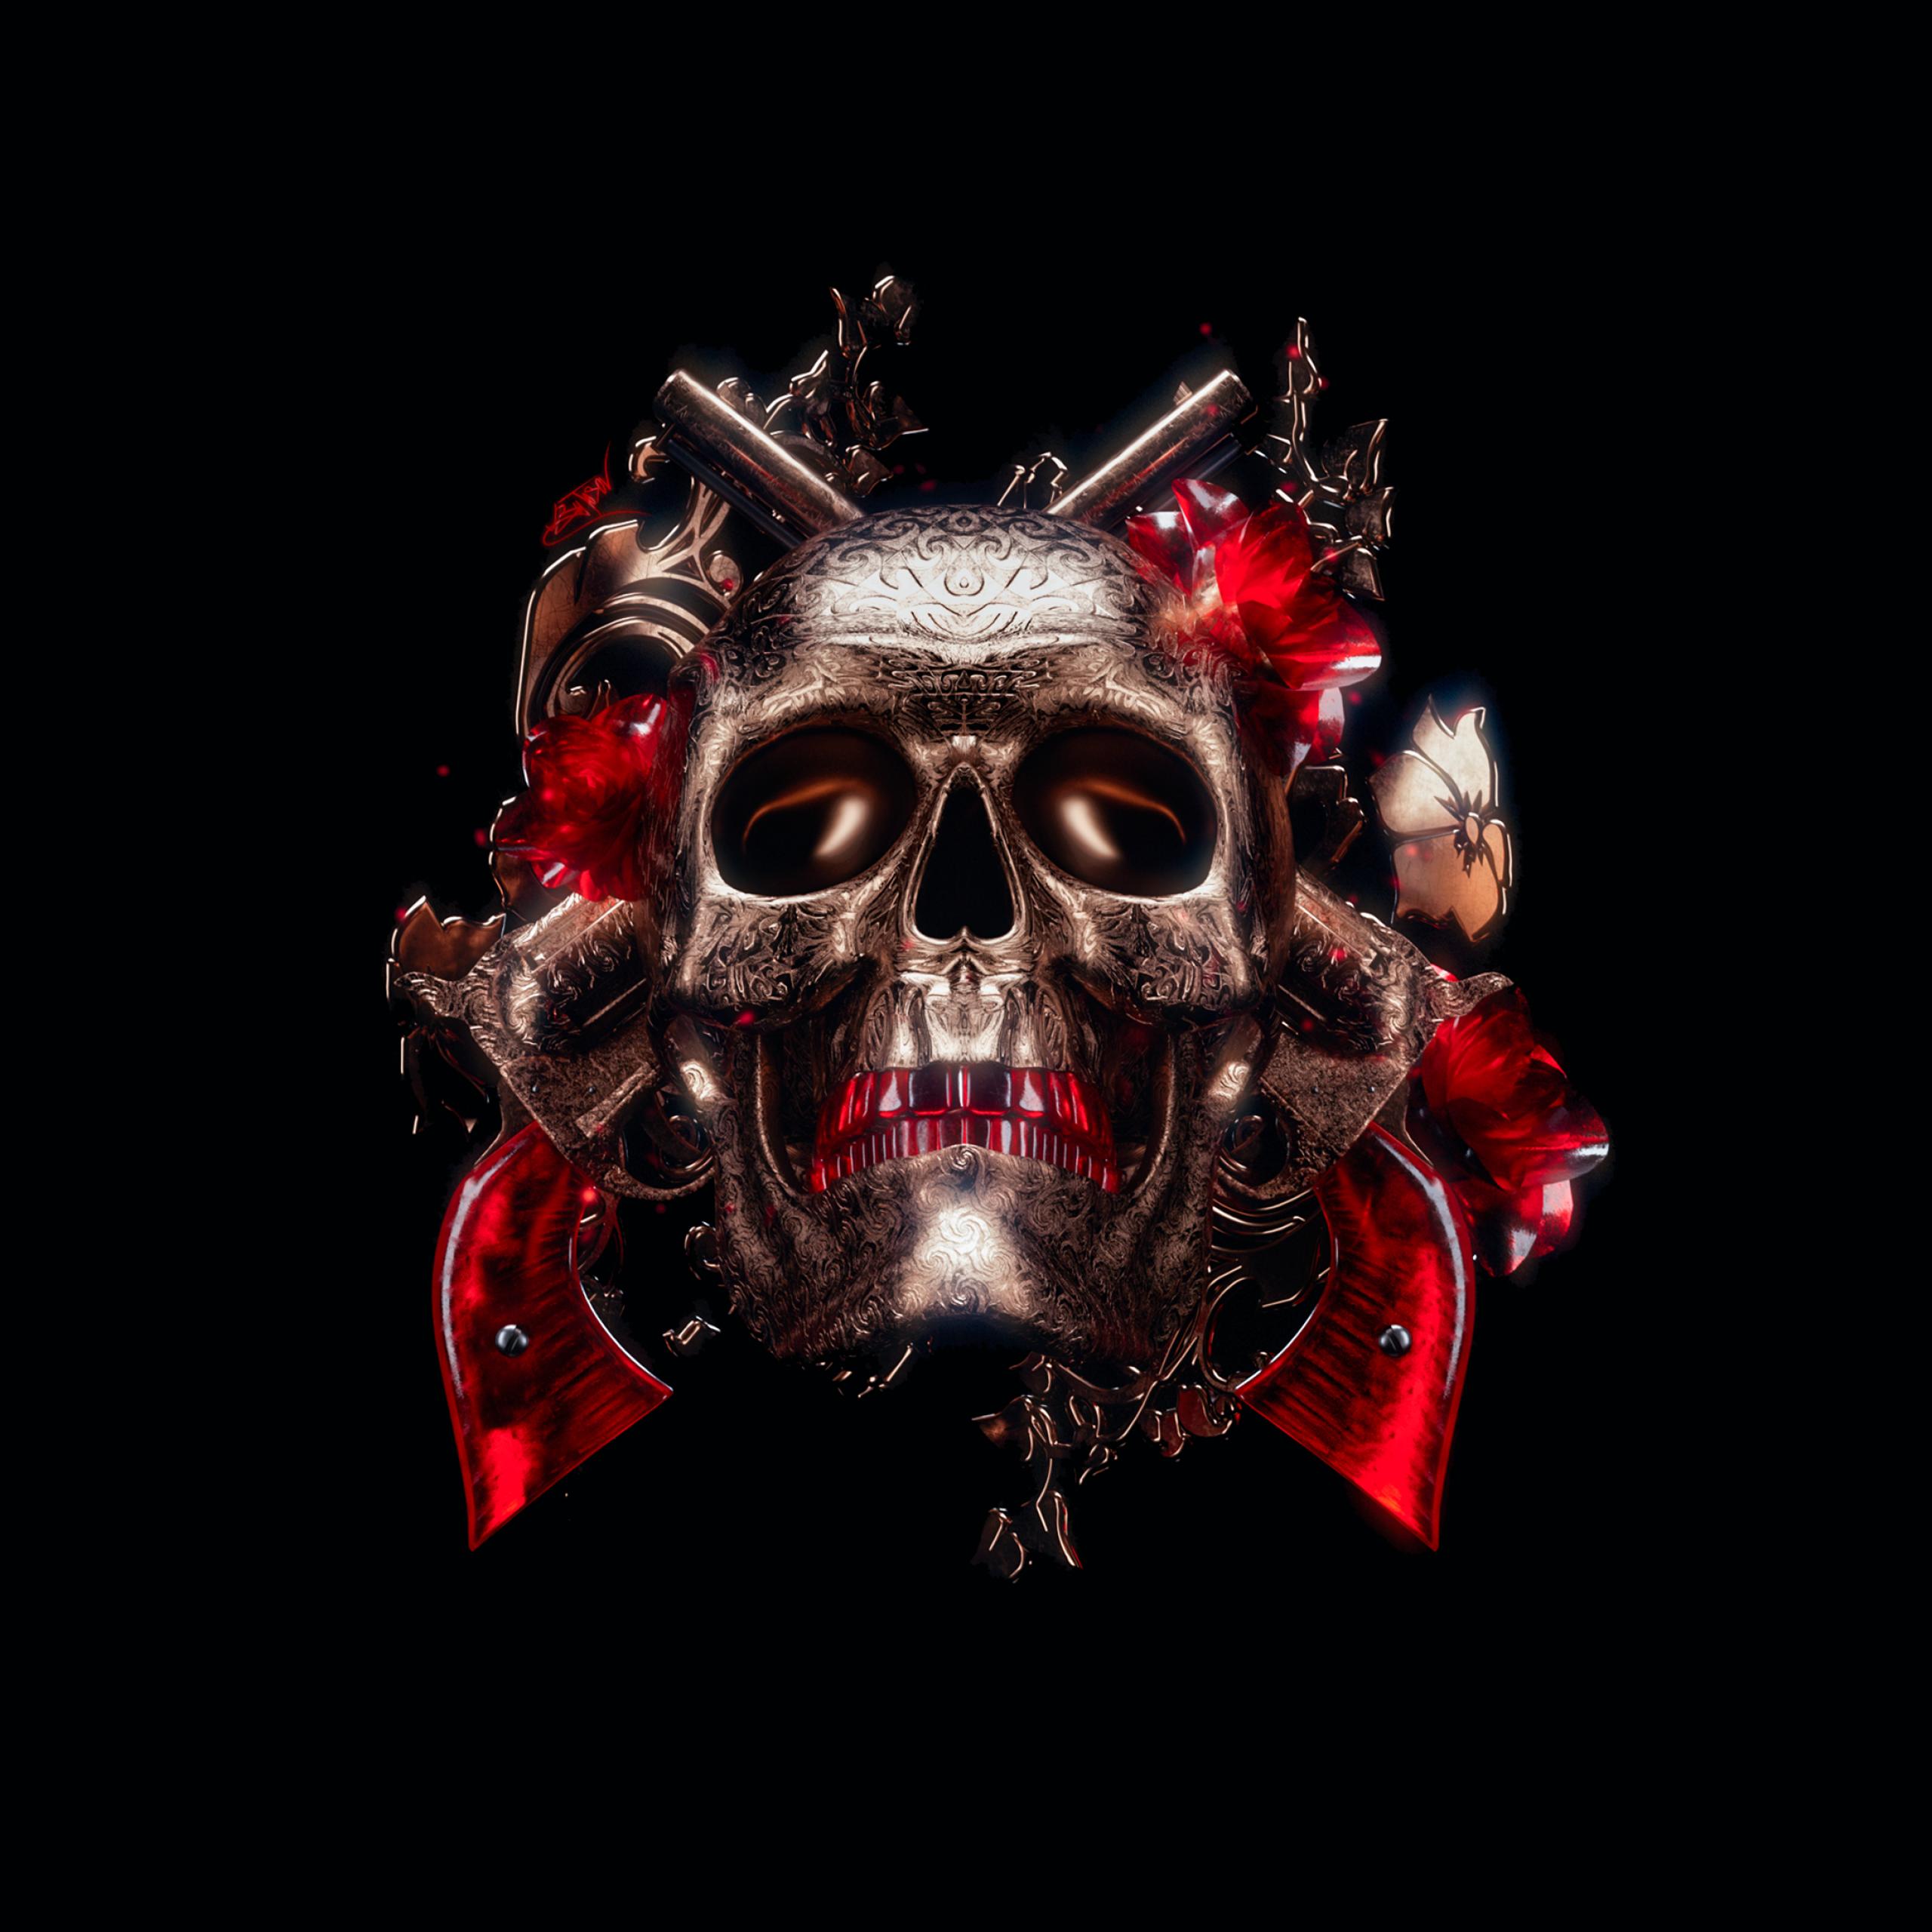 4K Wallpaper Skull, 3D, Black Background, Graphics CGI, #926